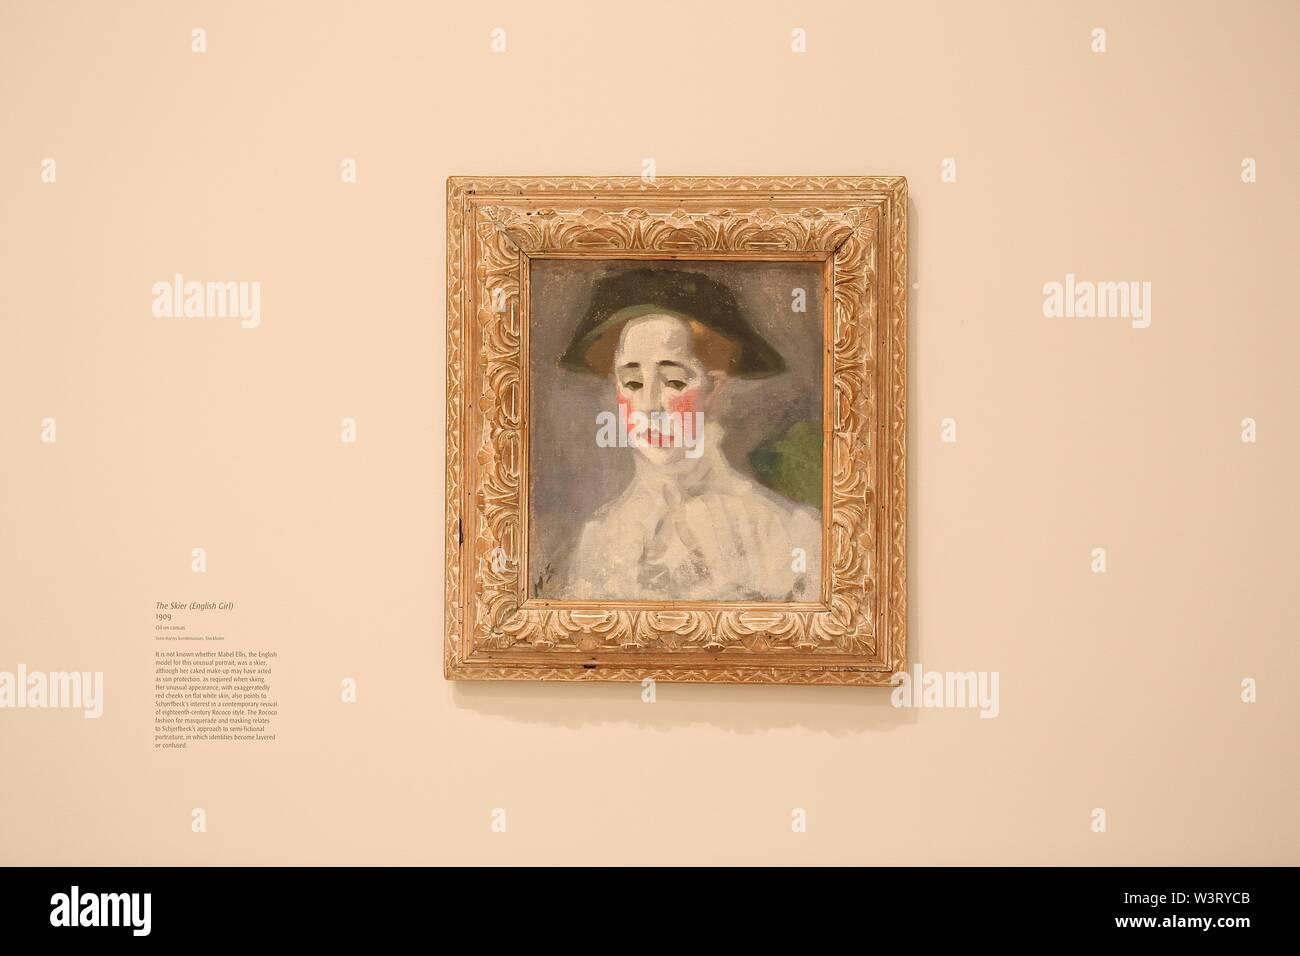 Helene Schjerfbeck 20 July - 27 October 2019 The Gabrielle Jungels - Winkler Galleries Royal Arts Academy , London UK Stock Photo